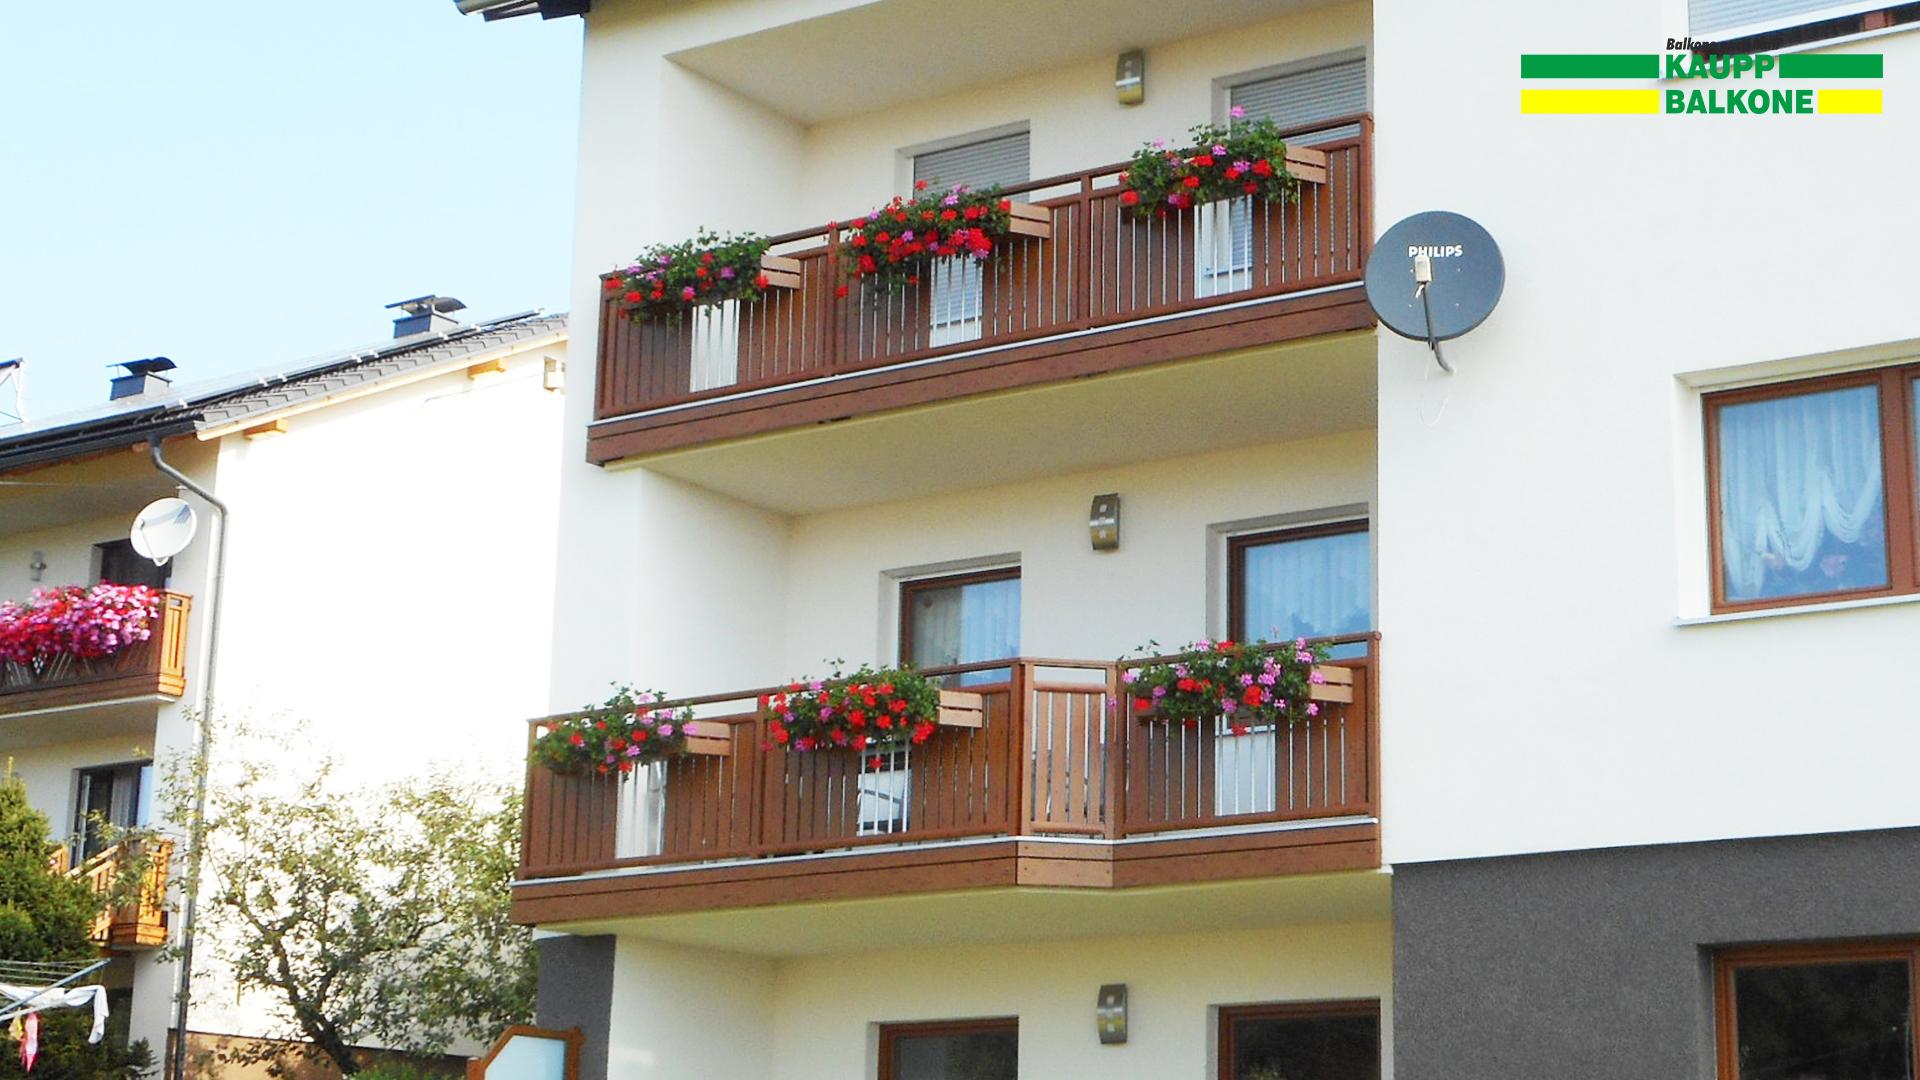 balkongel nder alu ab 140 kaupp balkone sterreich. Black Bedroom Furniture Sets. Home Design Ideas